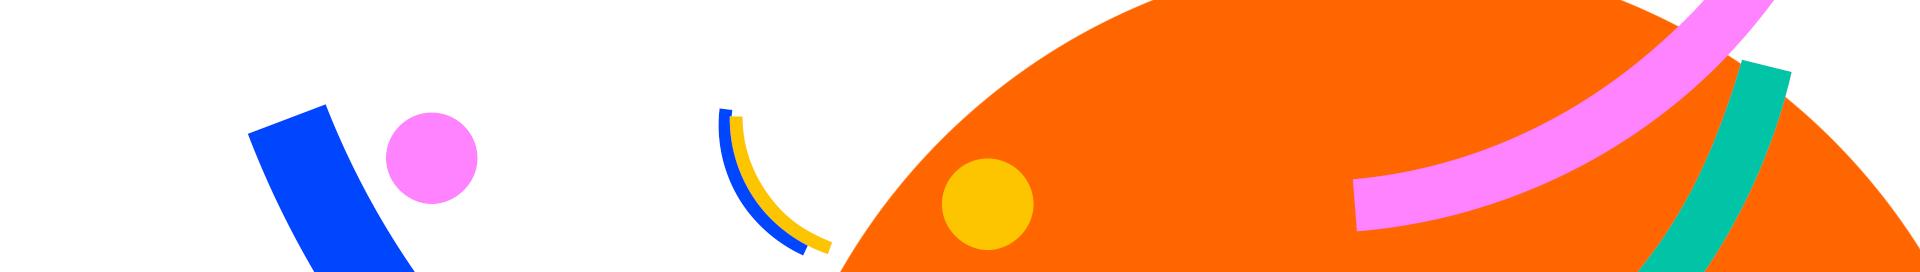 lkj-headerbild7